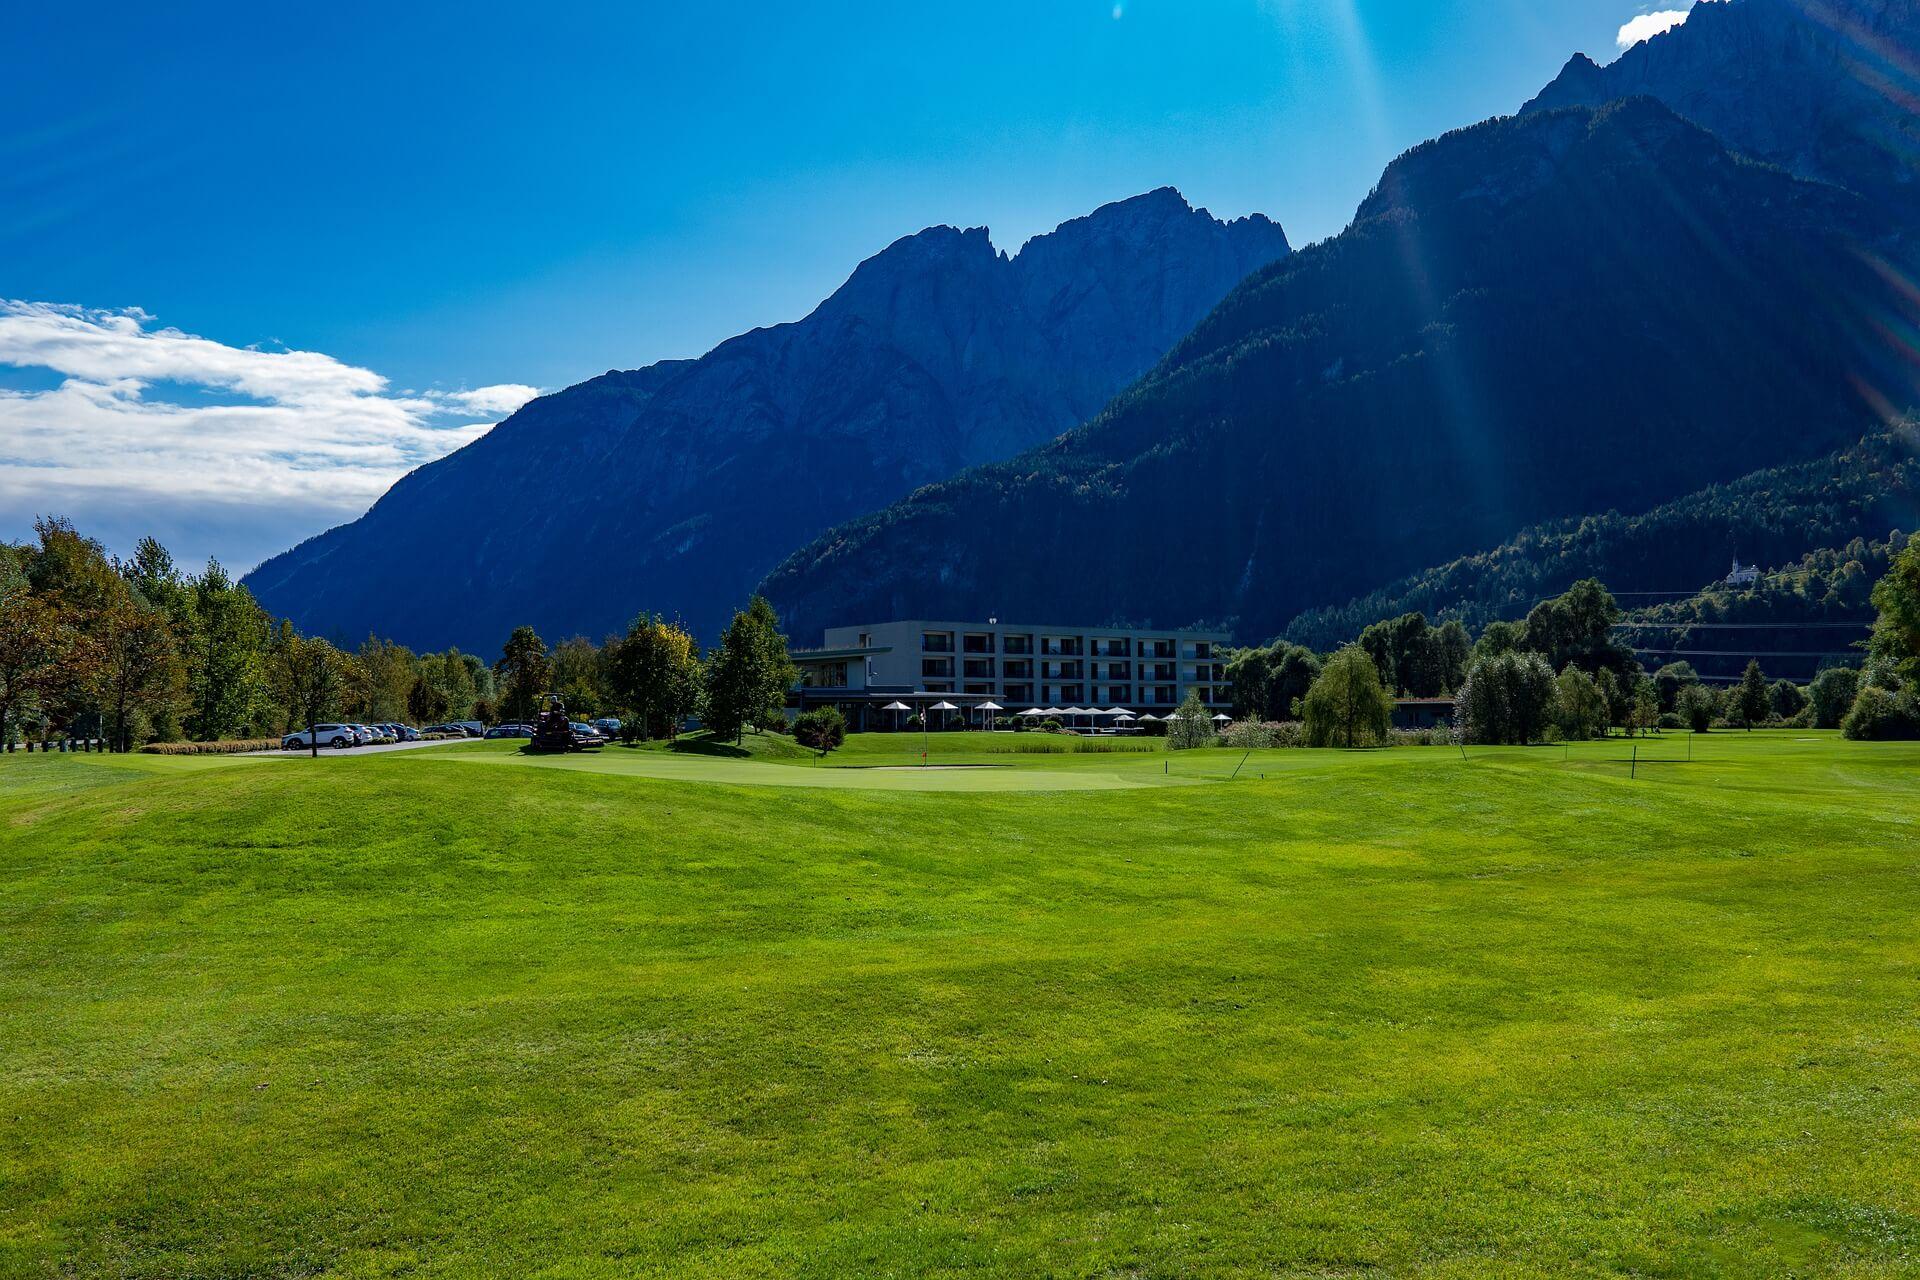 Golfclub Dolomitengolf Osttirol   Lavant bei Lienz Osttirol